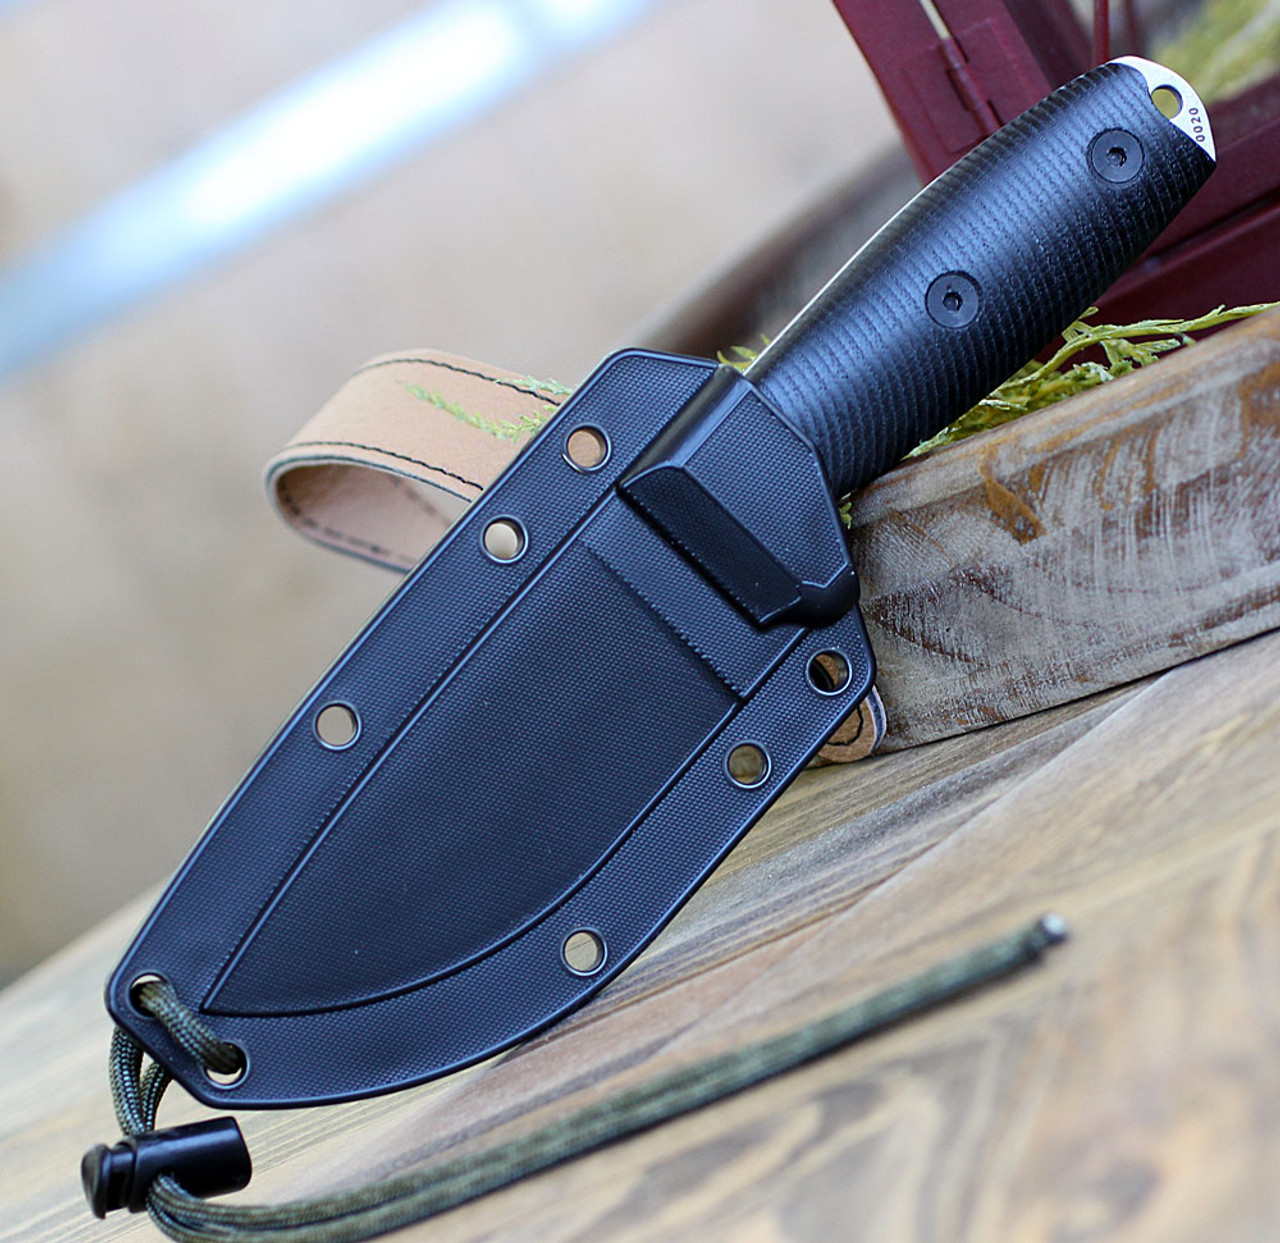 "ESEE-3 3PMS35V-001, 3.88"" S35VN Stonewash Plain Blade, Black G10 3D Handle, Black Sheath"